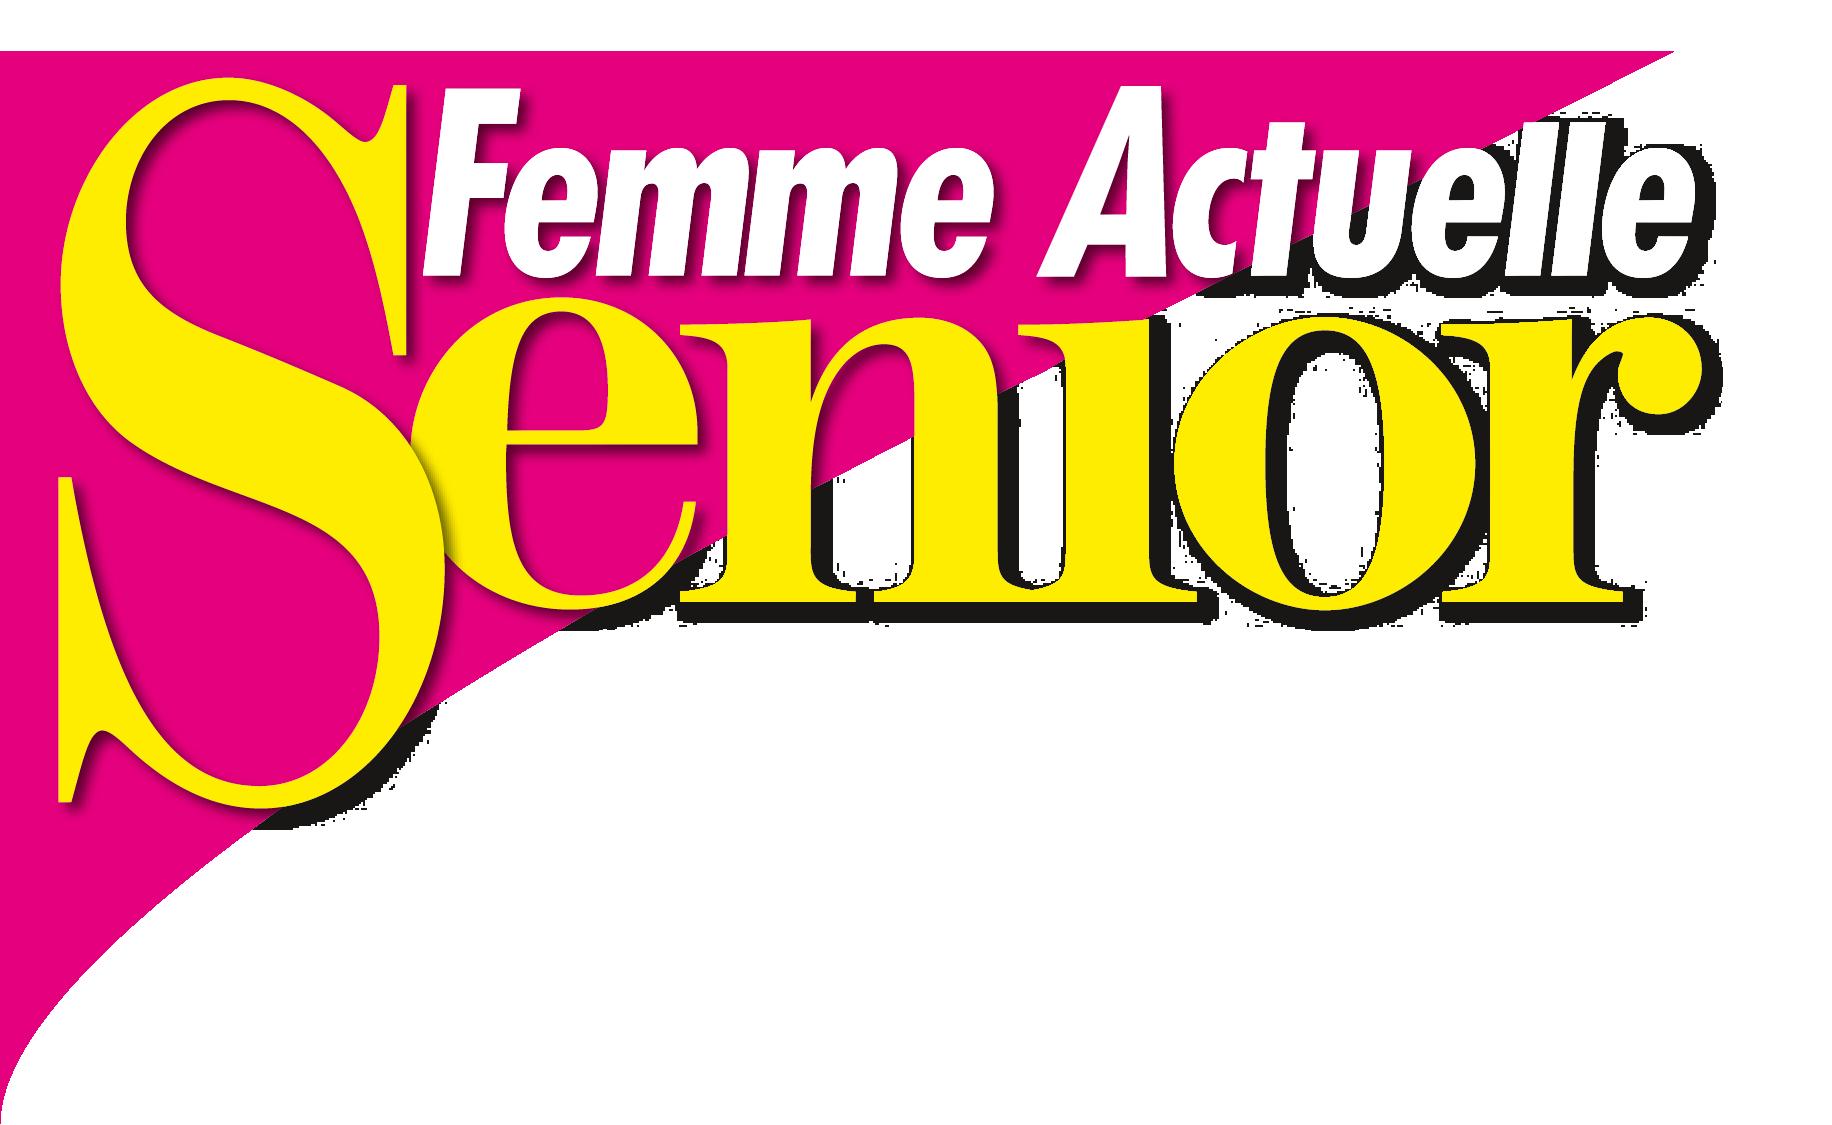 Femme Actuelle Senior